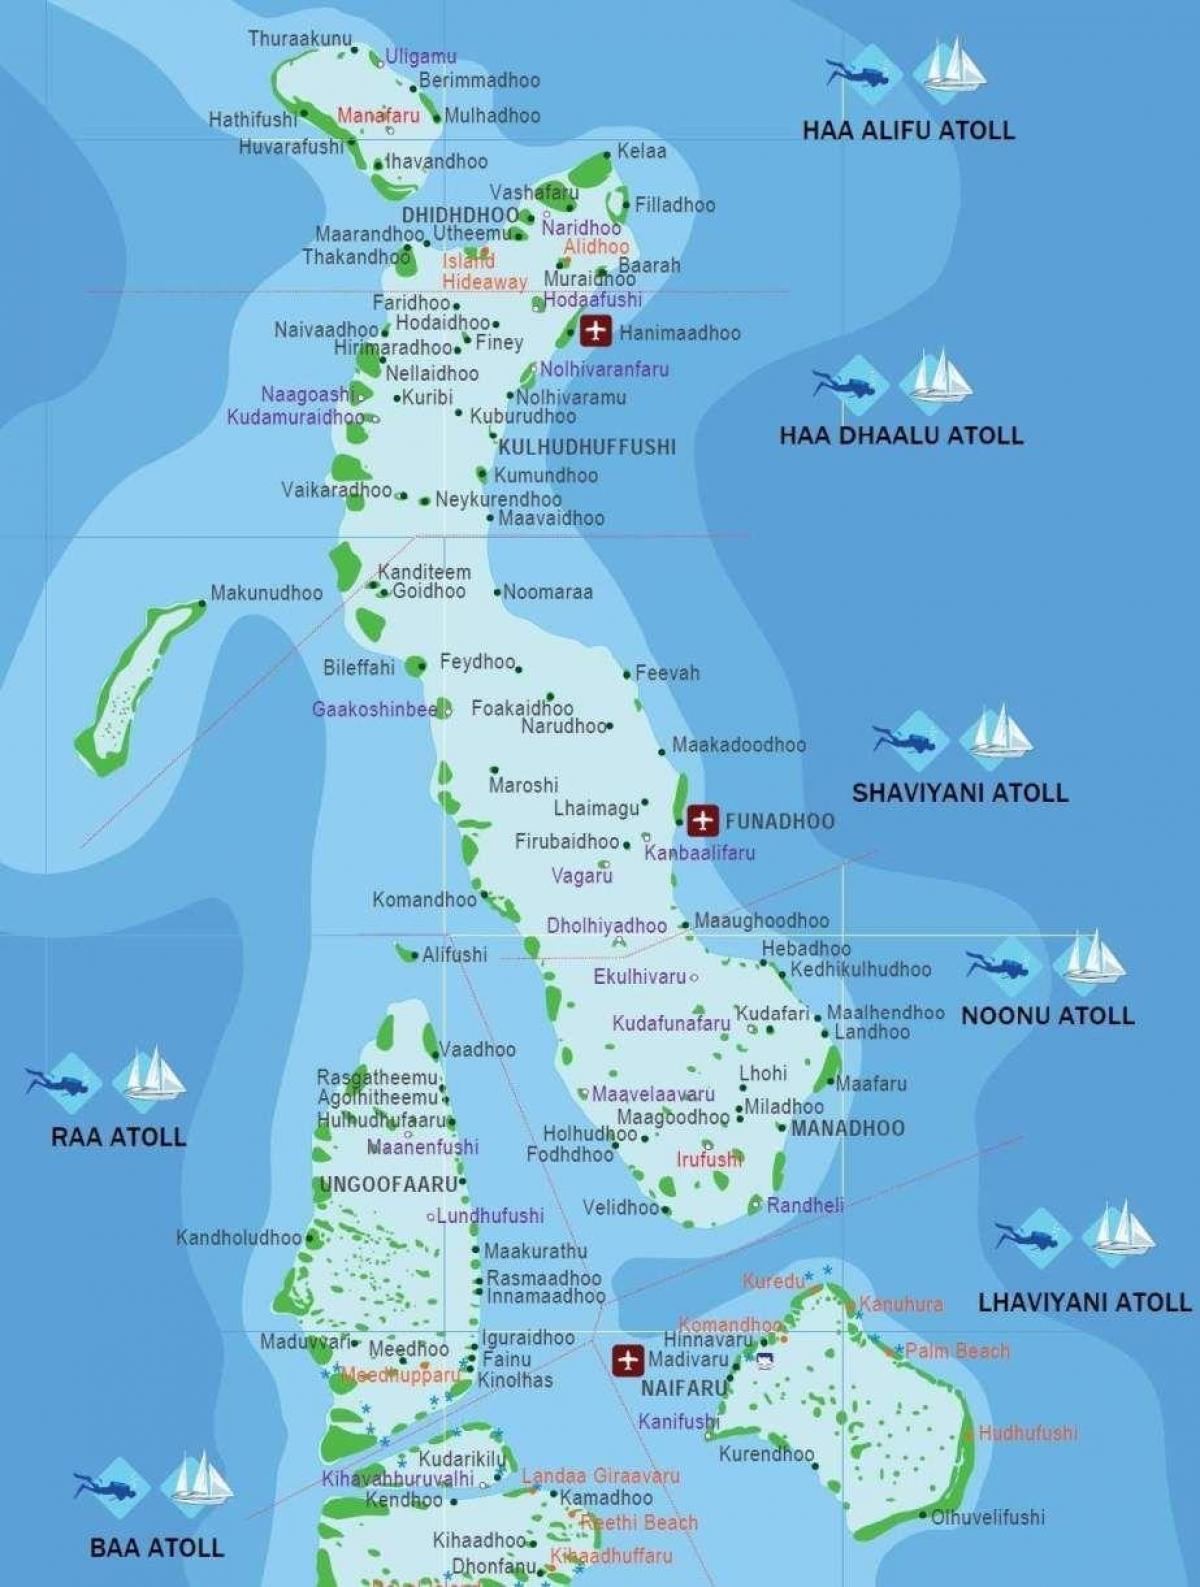 Carte Asie Maldives.Kani Maldives Carte Carte De Kani Maldives Asie Du Sud Asie